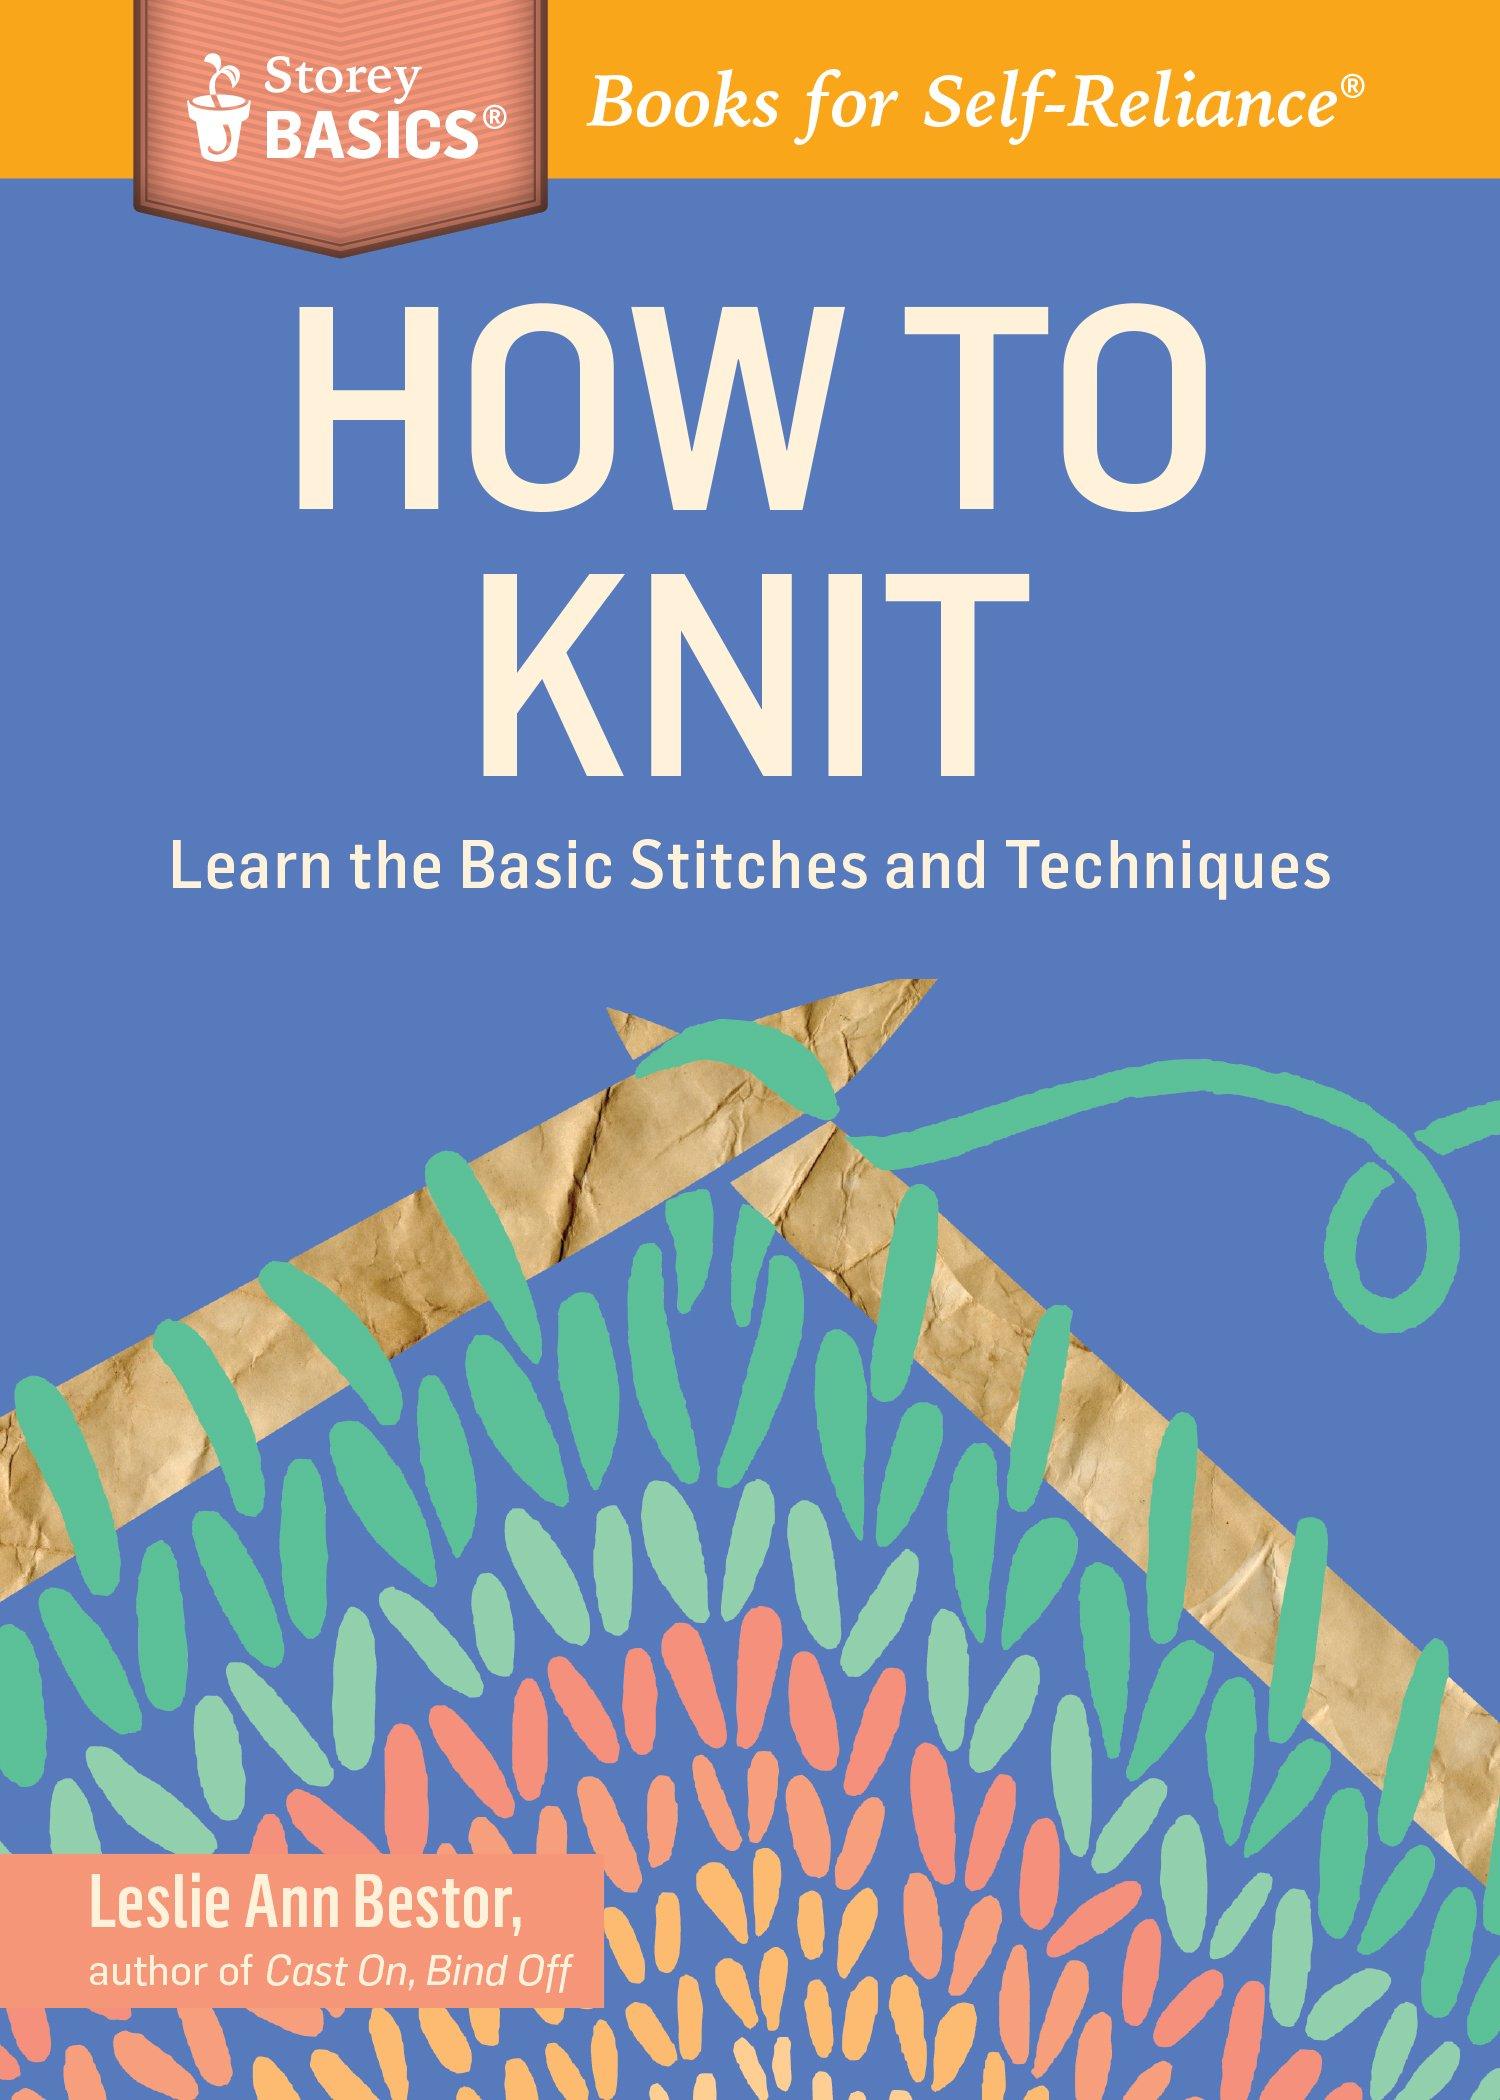 How Knit Stitches Techniques BASICS product image